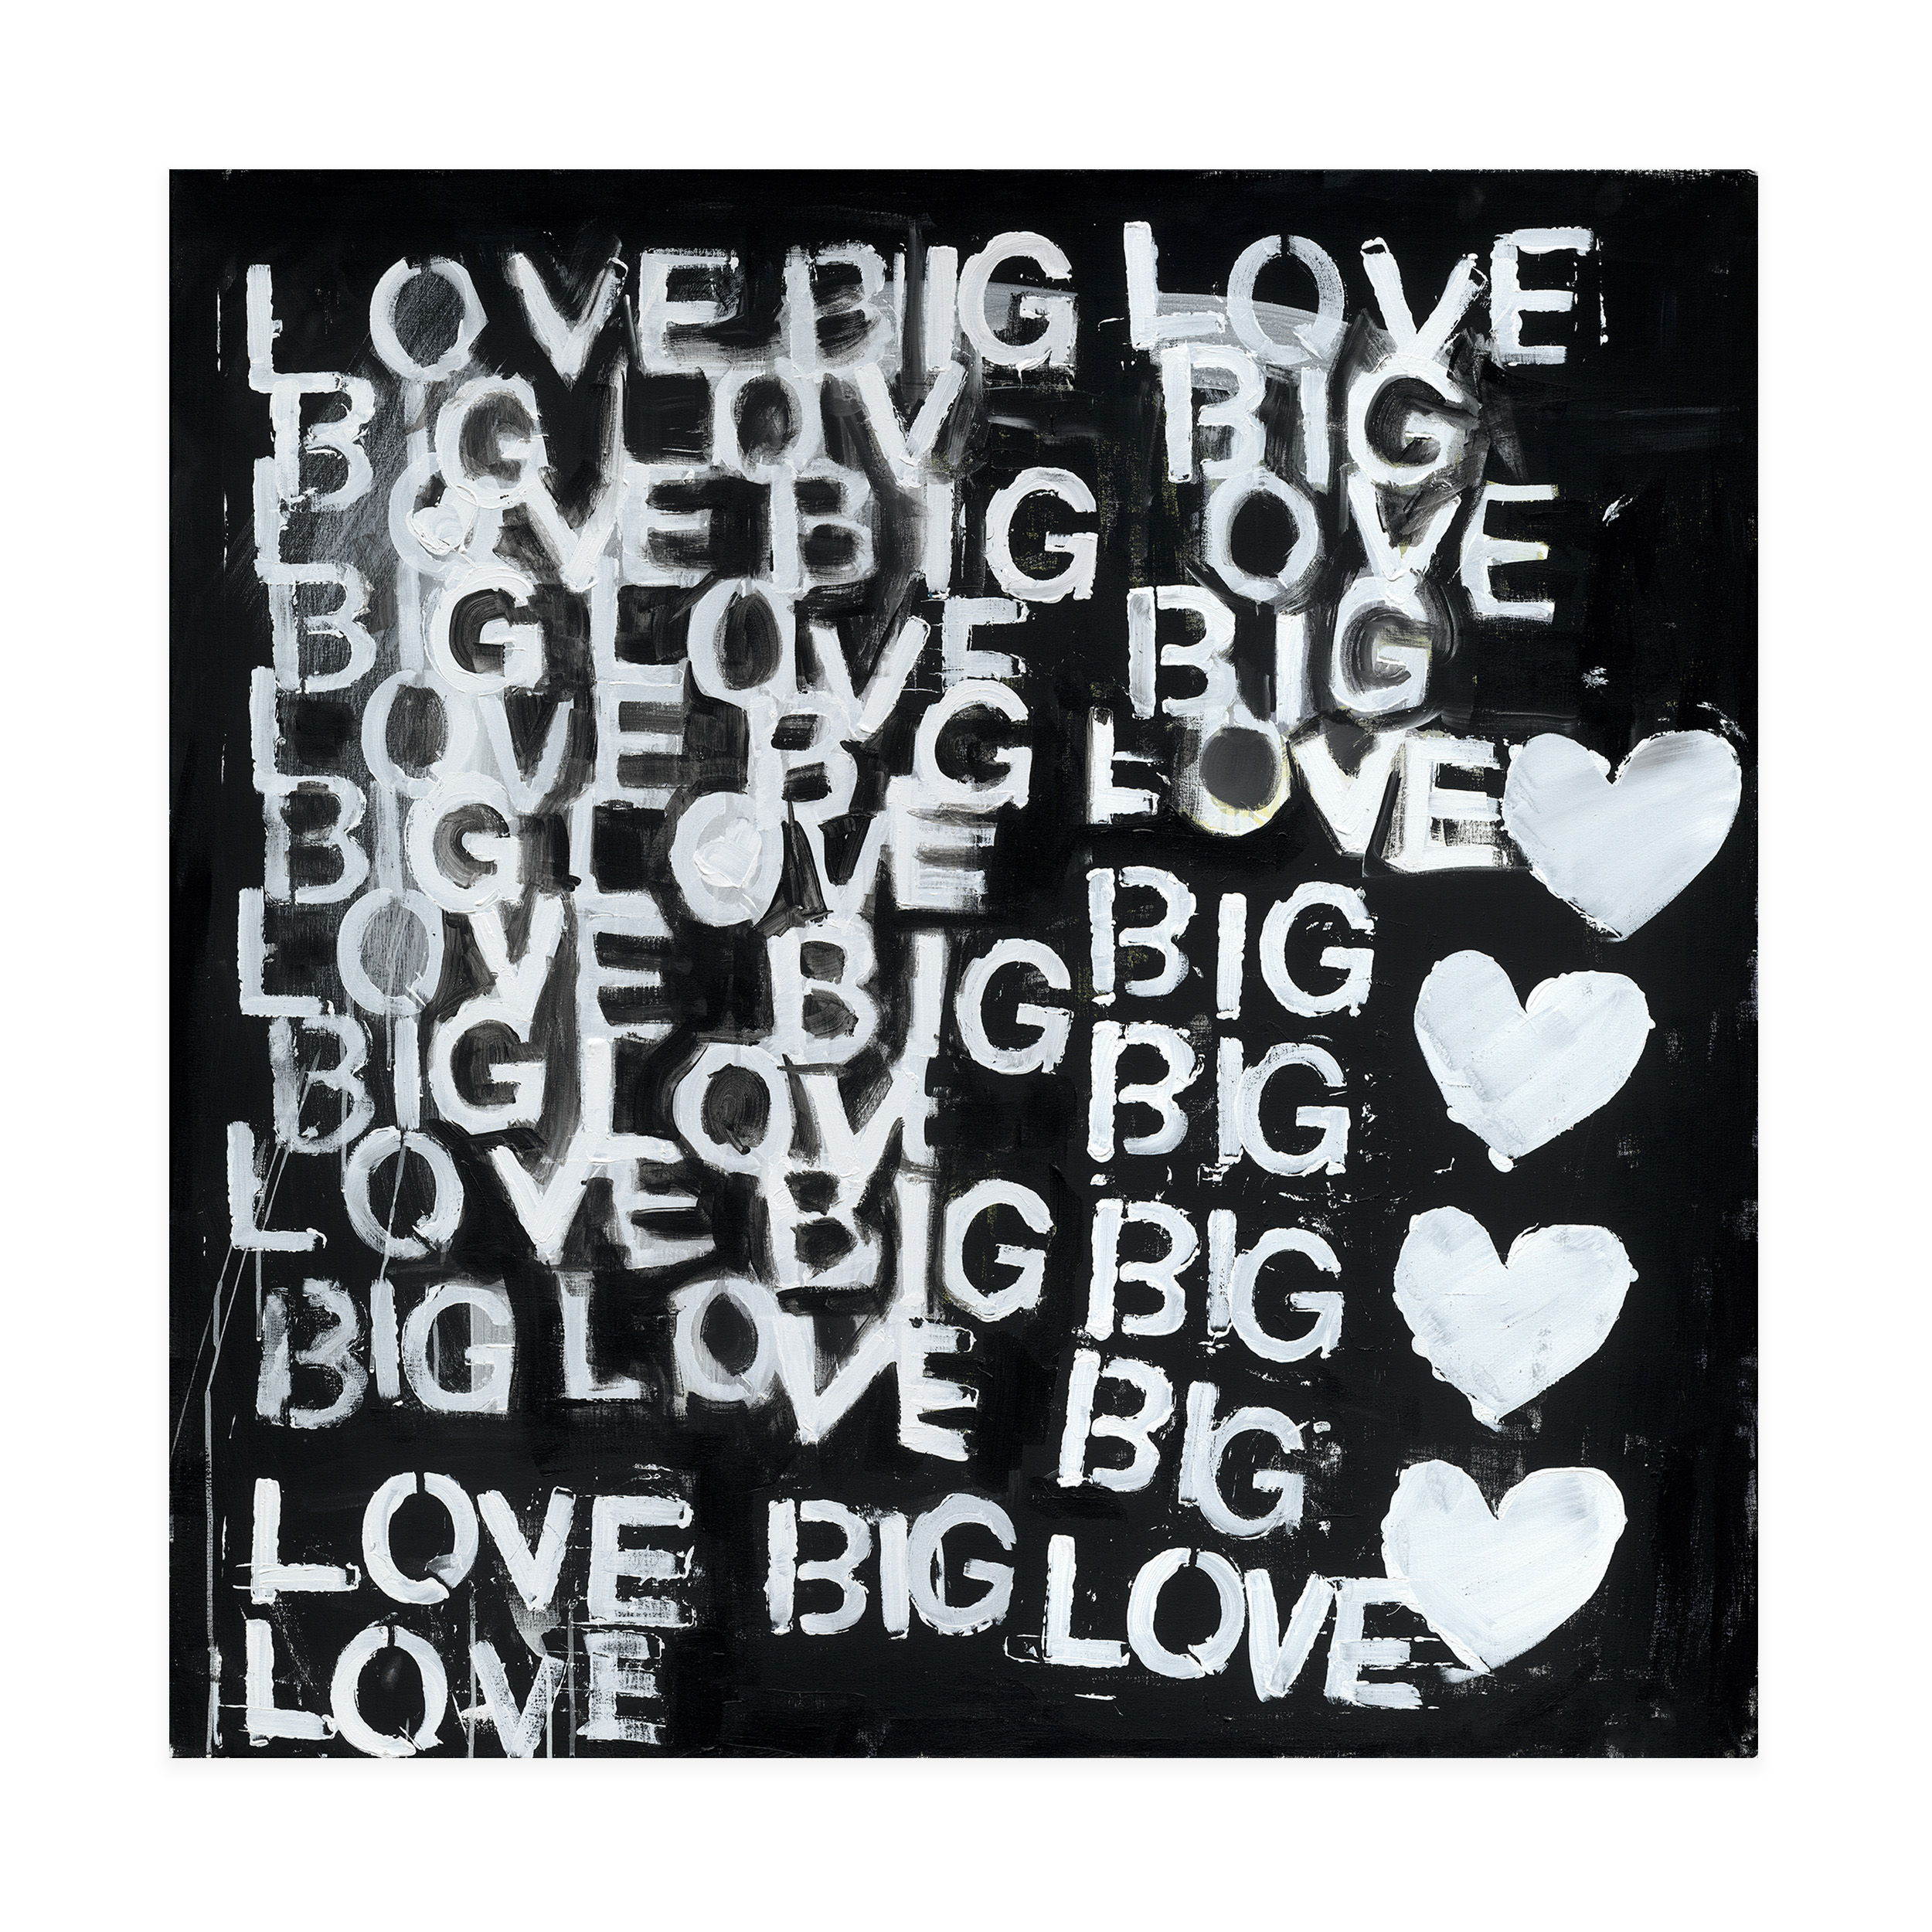 ART_SQUARE WEB TEMPLATE_0005_WORDS_LOVE BIG LOVE.jpg